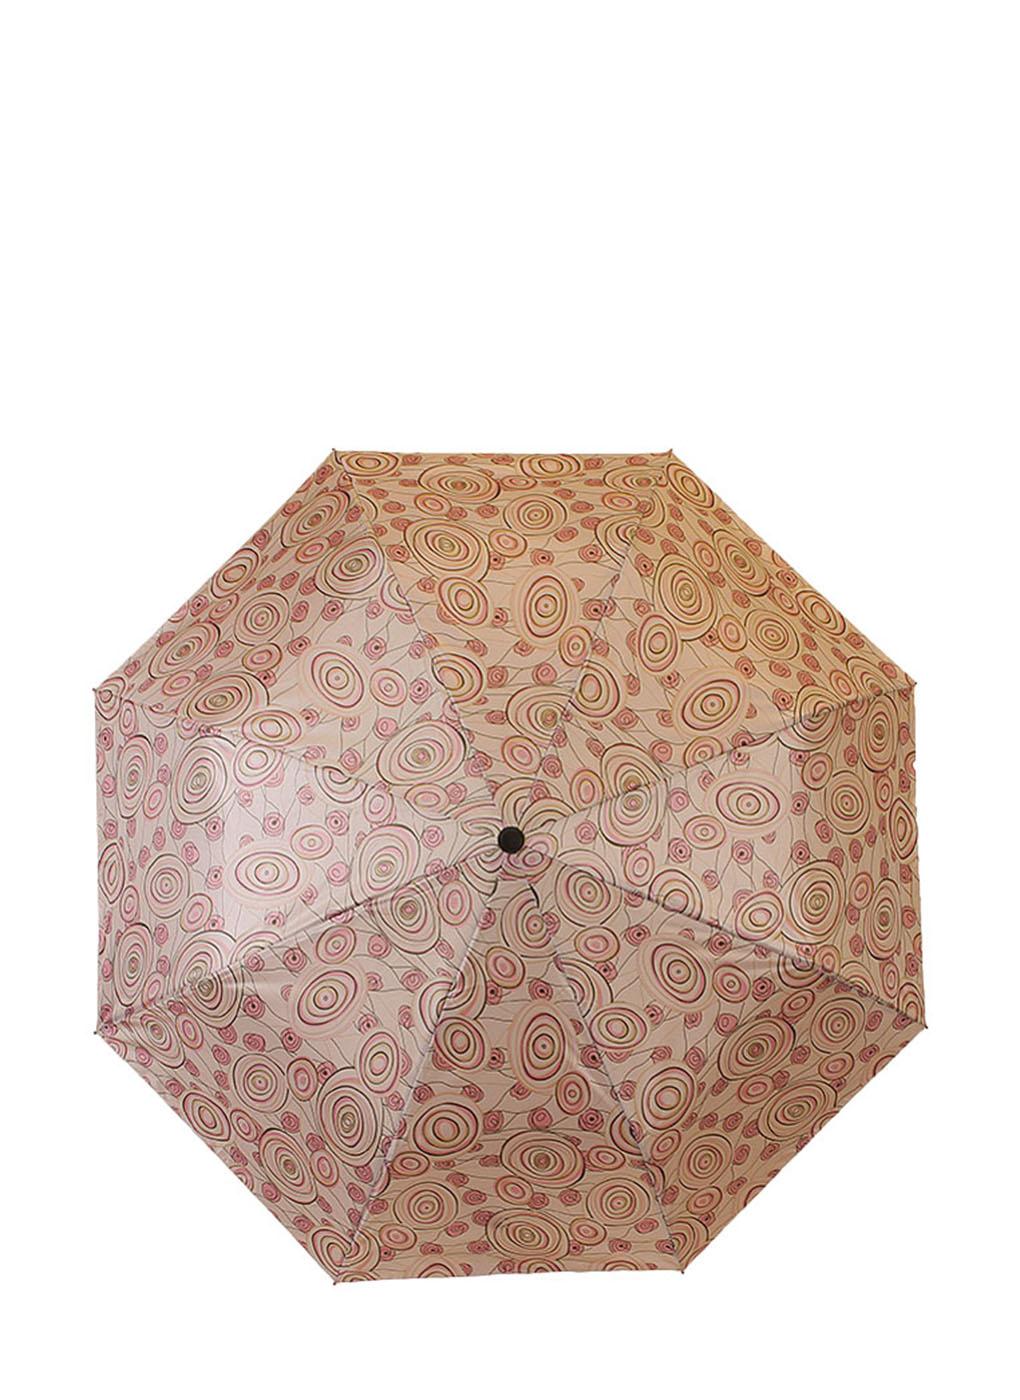 Зонт автоматический женский 02, Lorentino фото